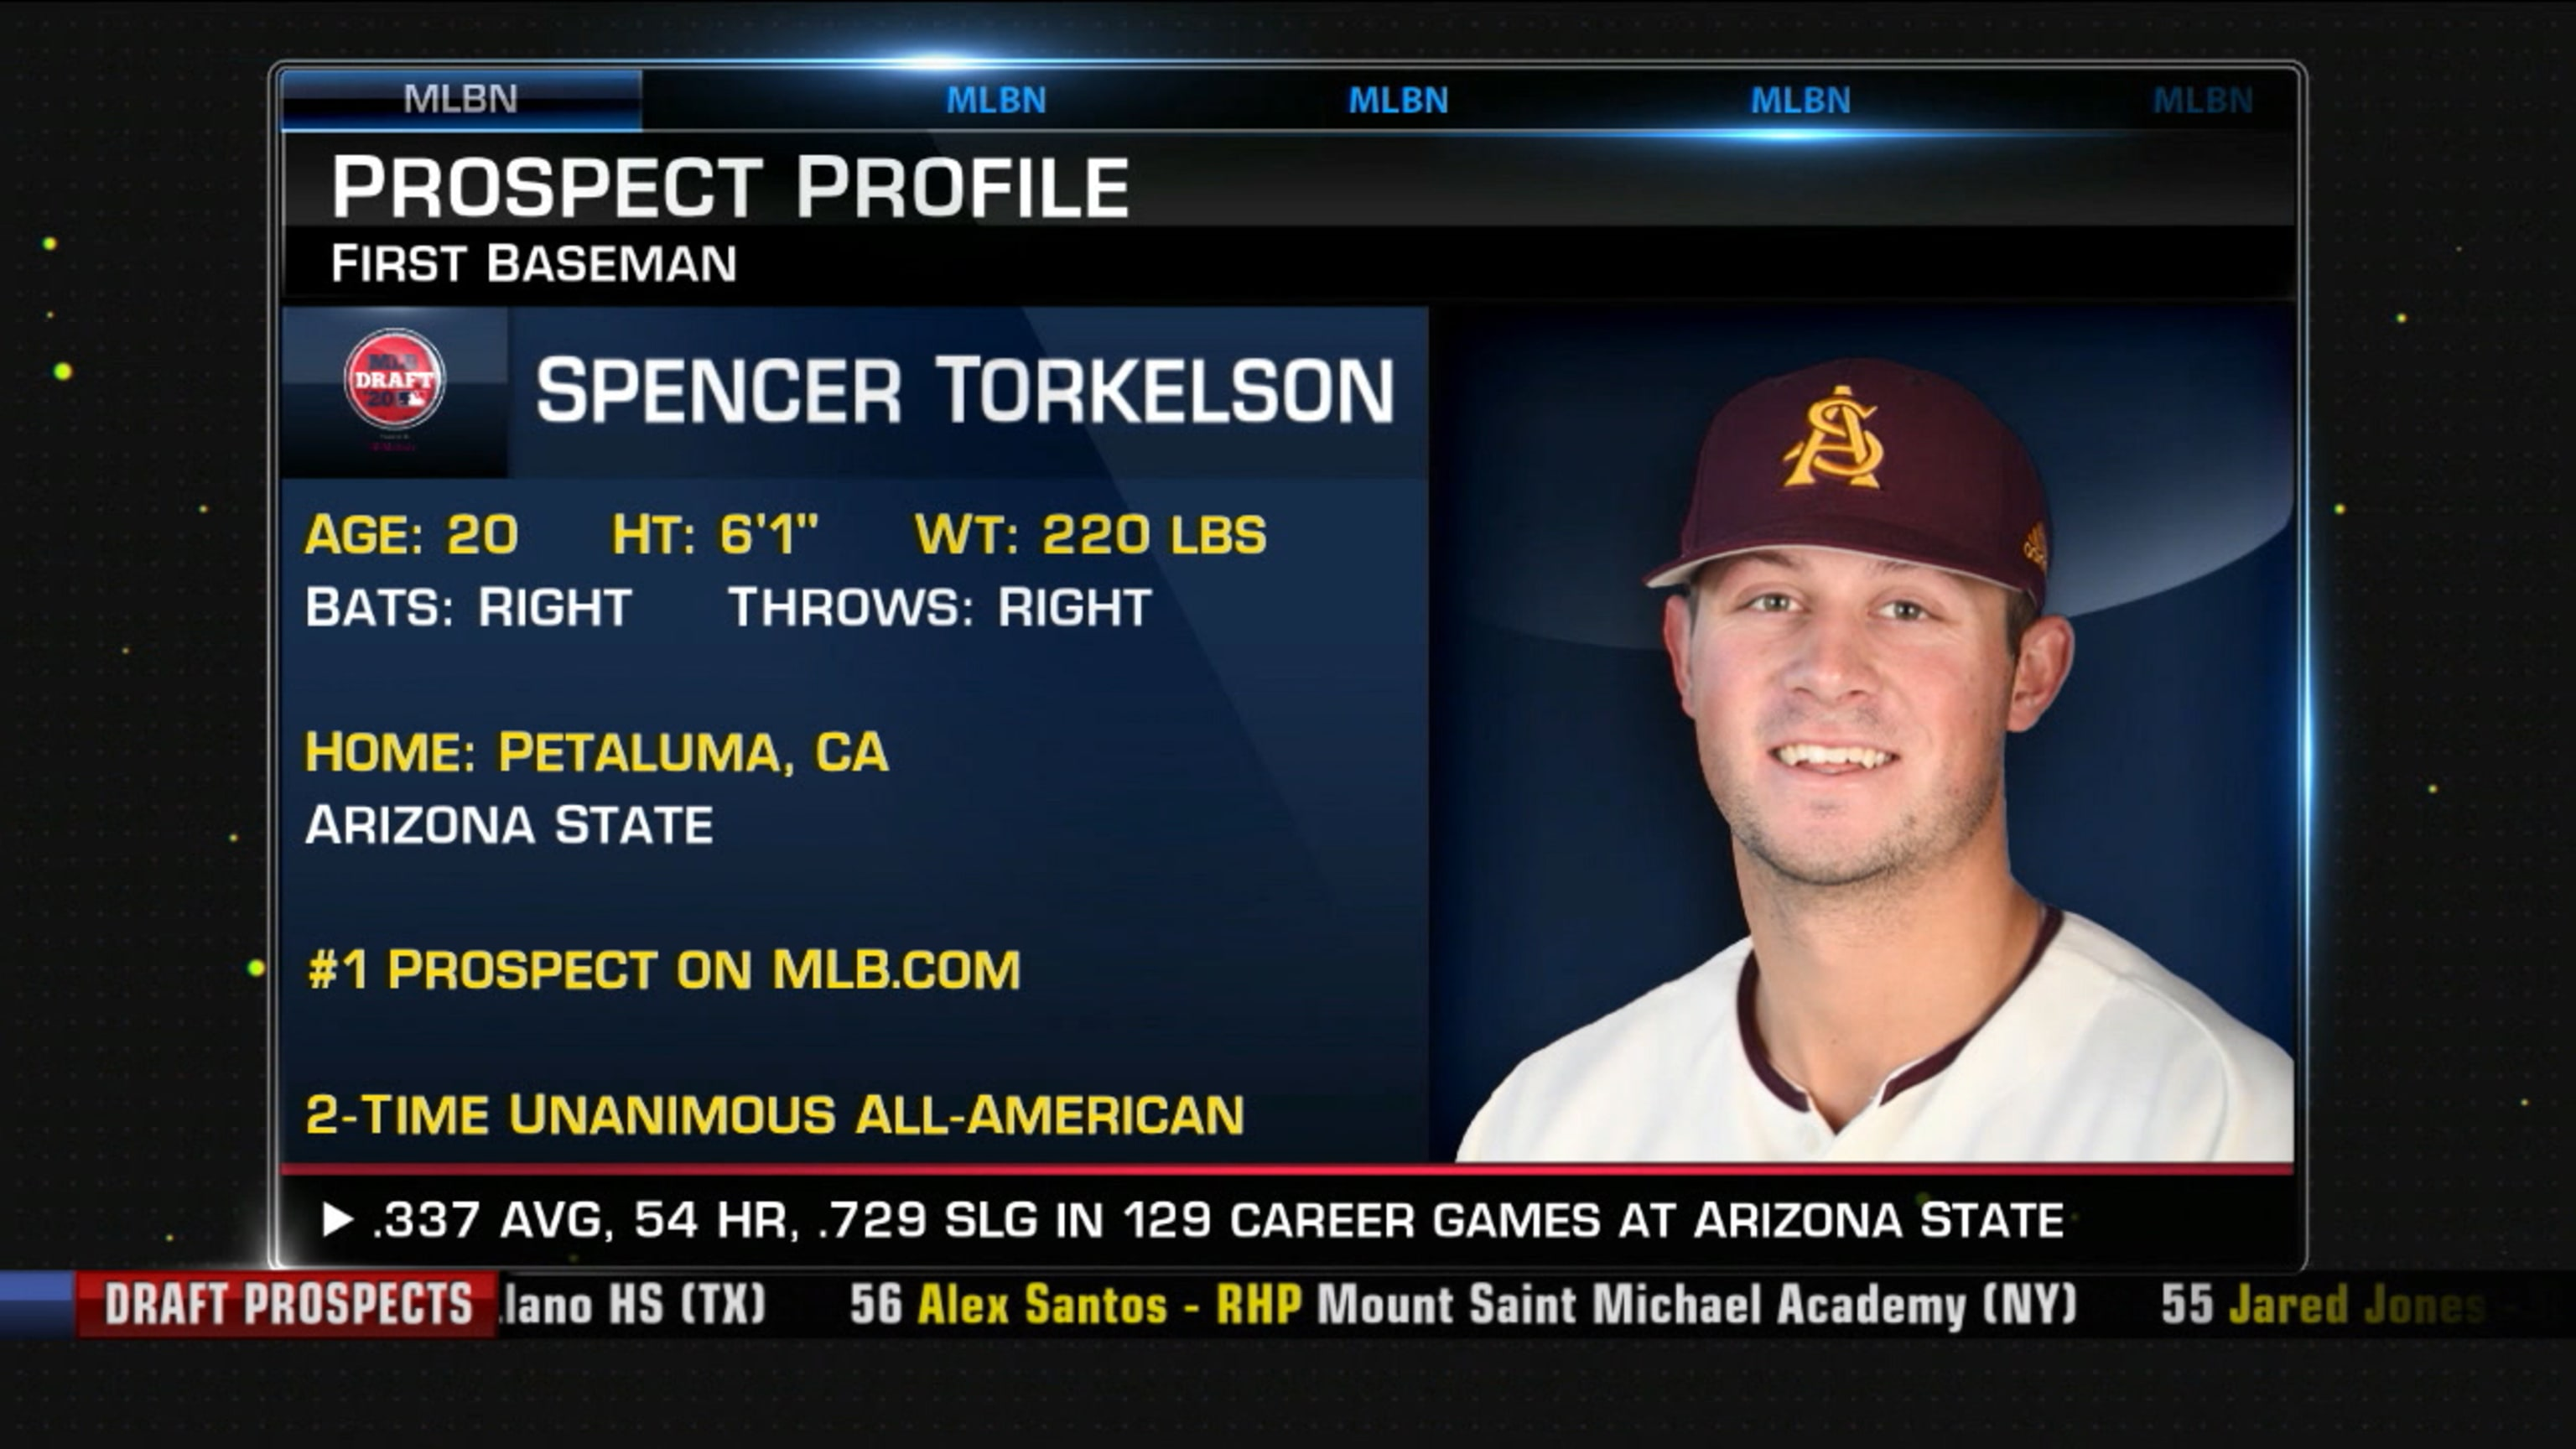 Desglosando Spencer Torkelson